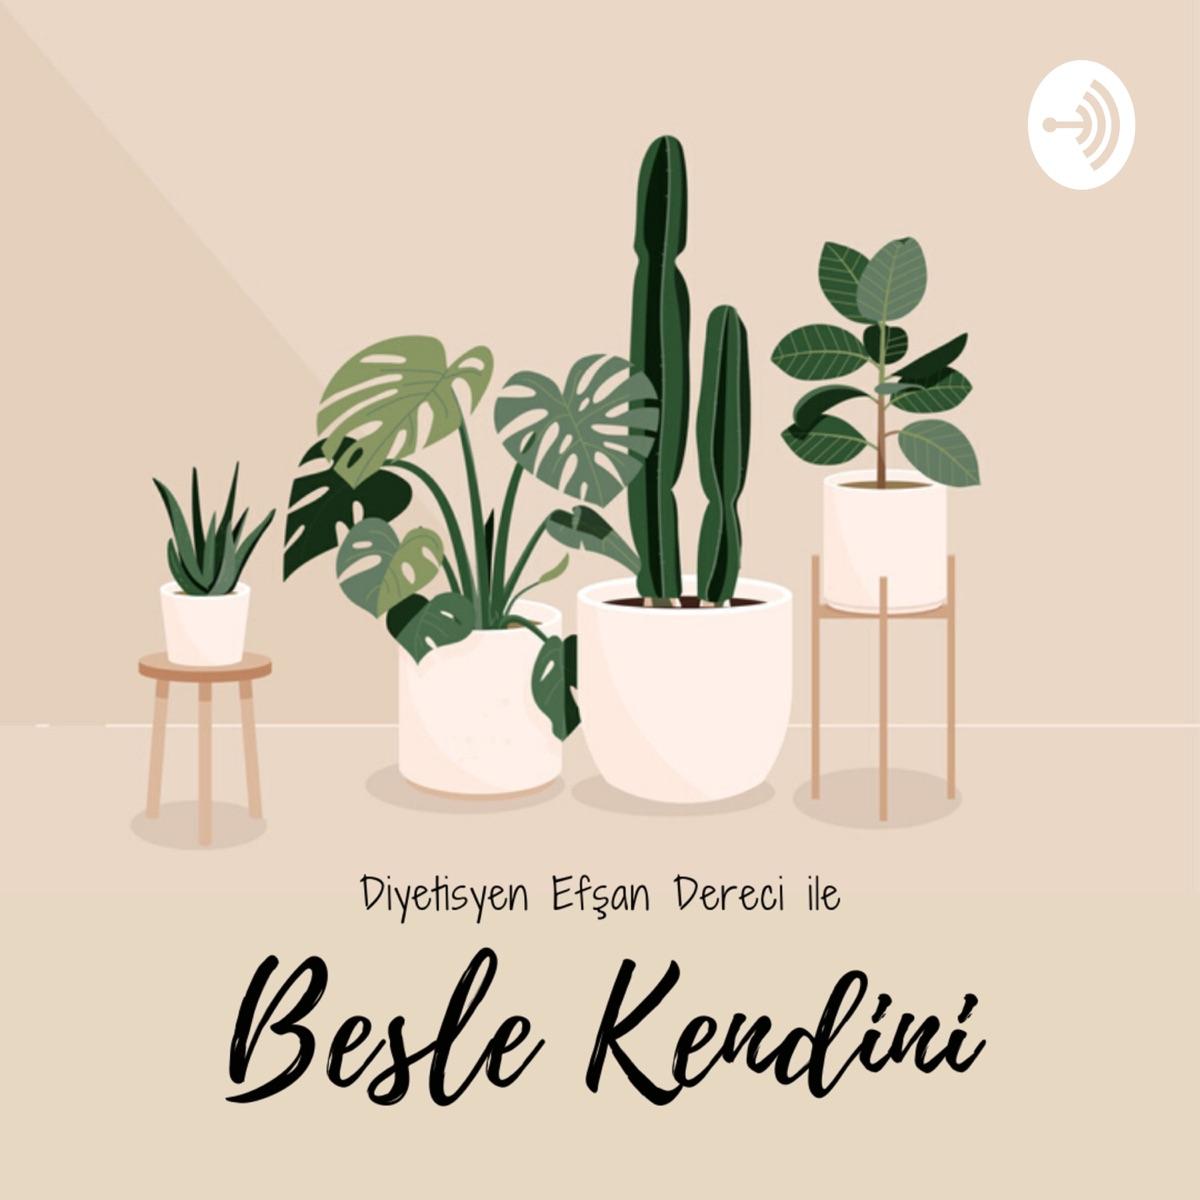 Besle Kendini Podcast